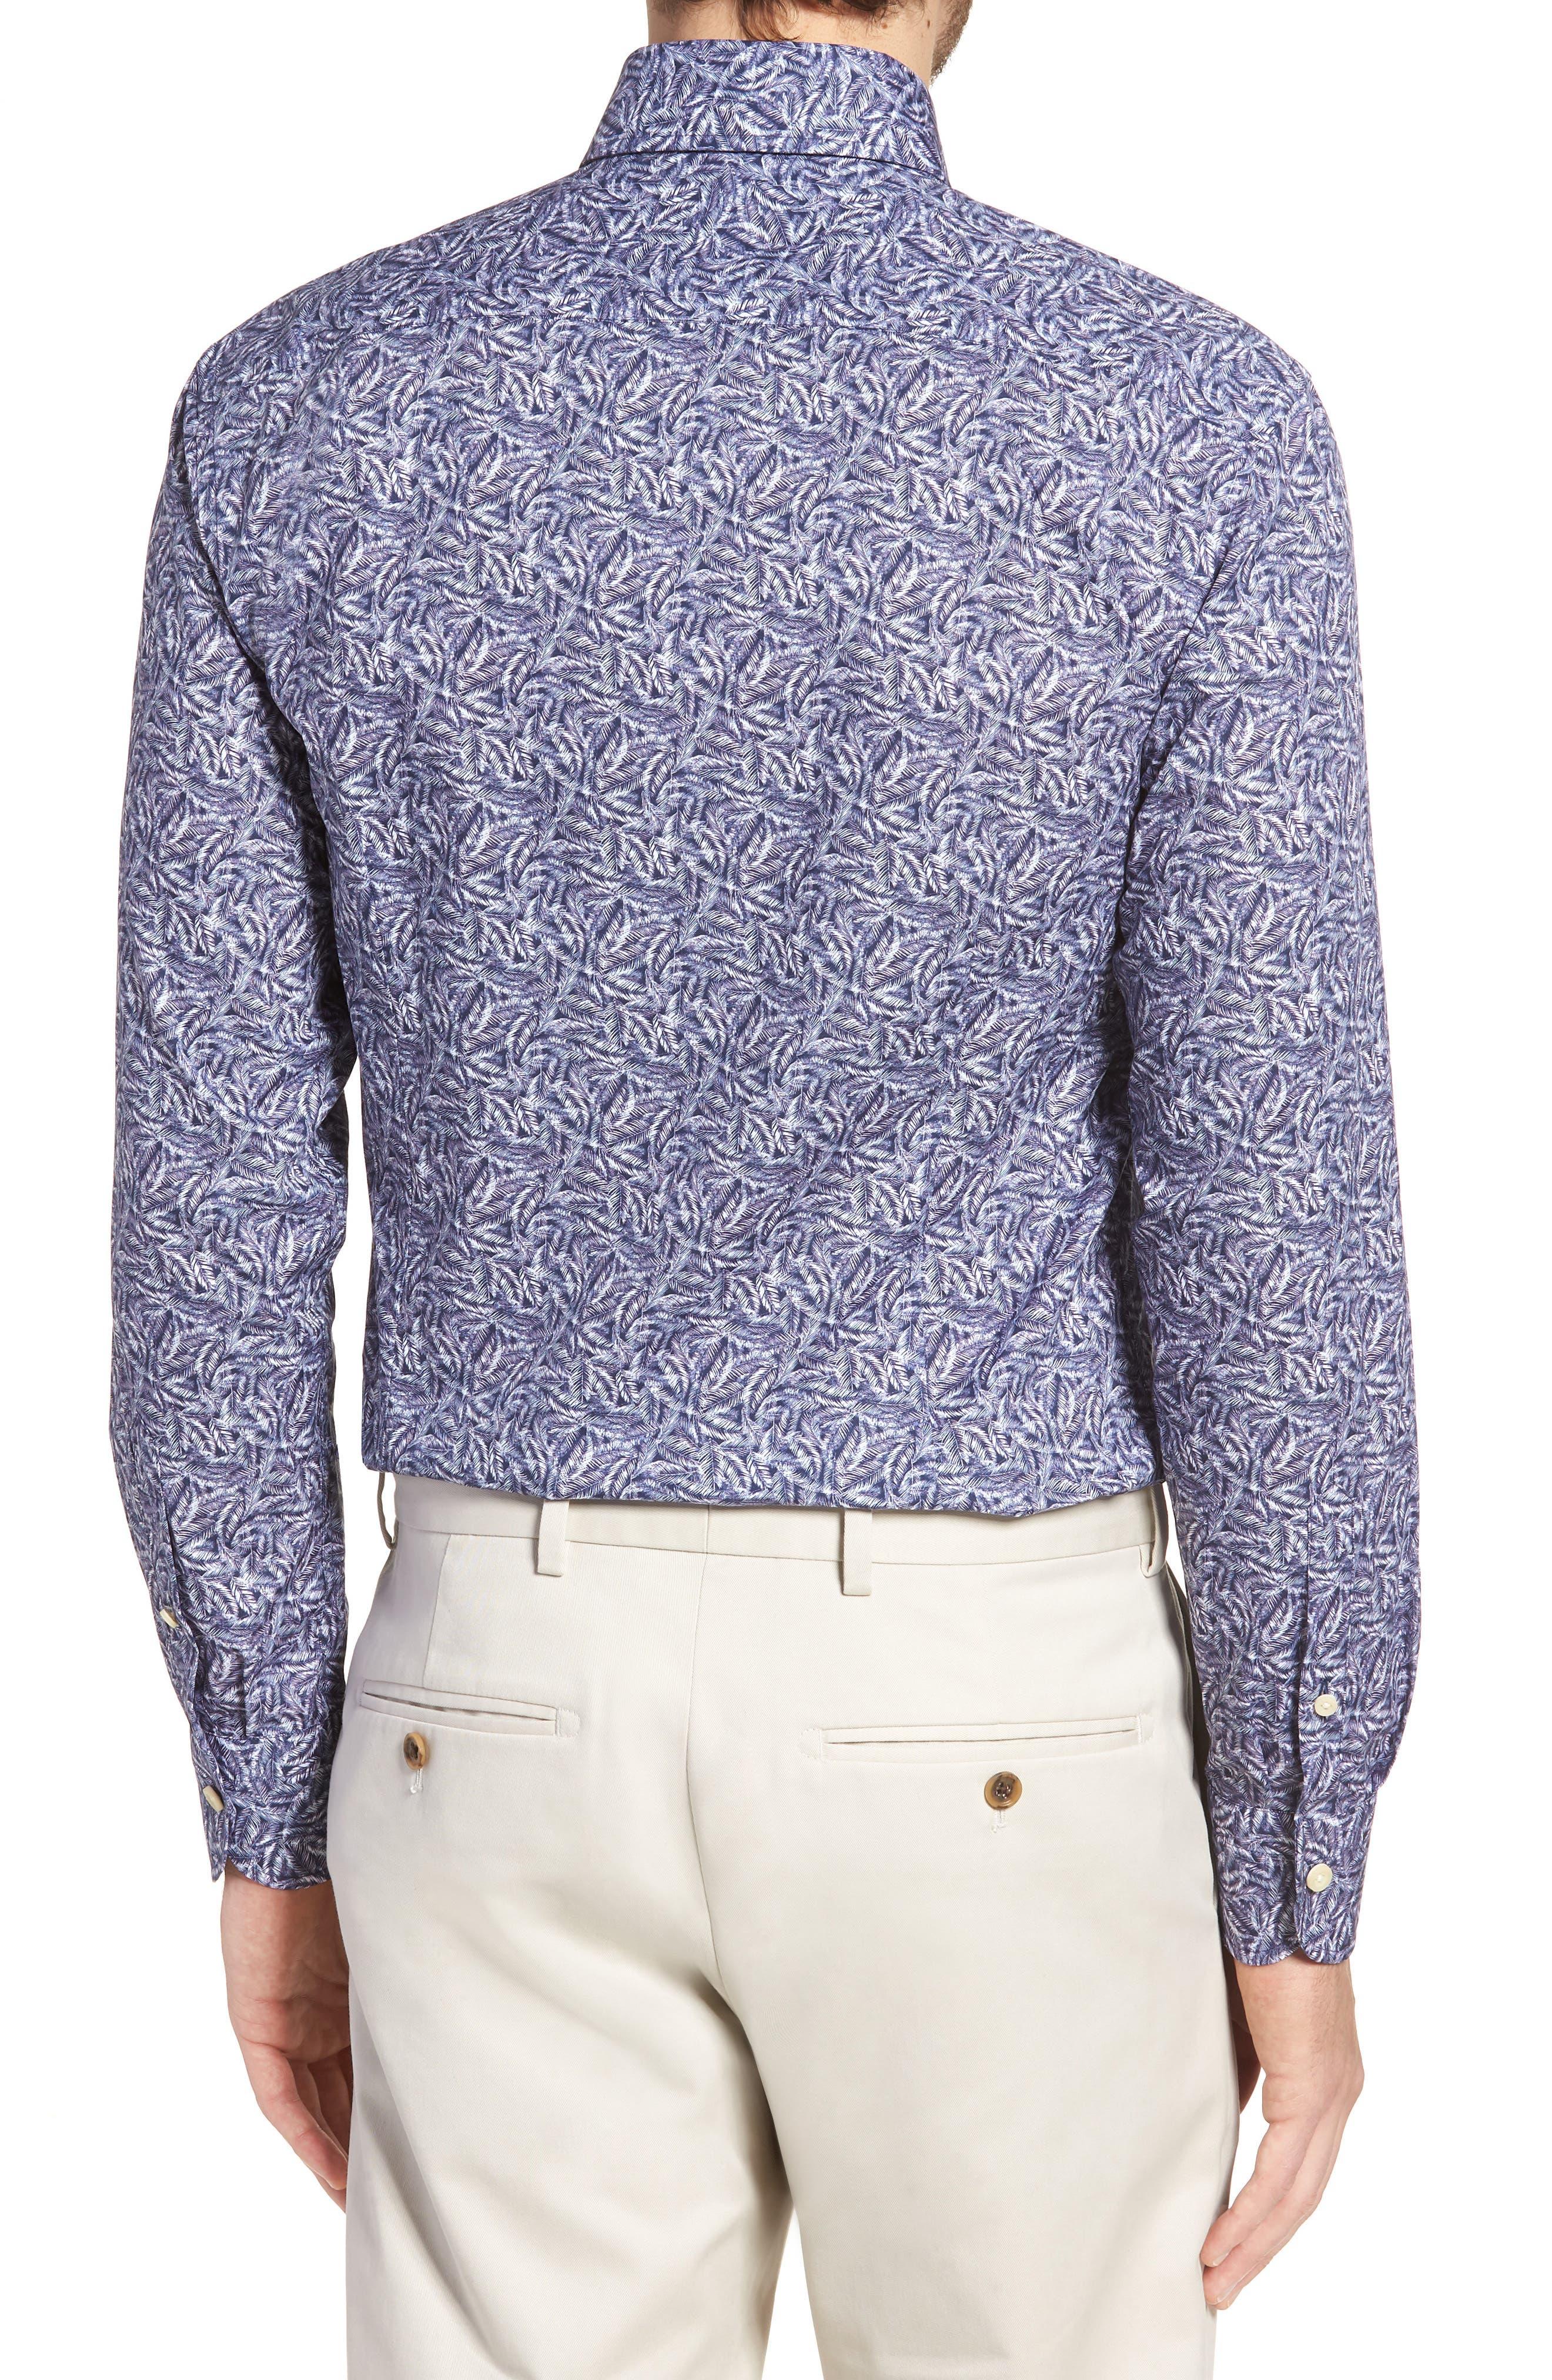 Garnaby Slim Fit Print Dress Shirt,                             Alternate thumbnail 3, color,                             400